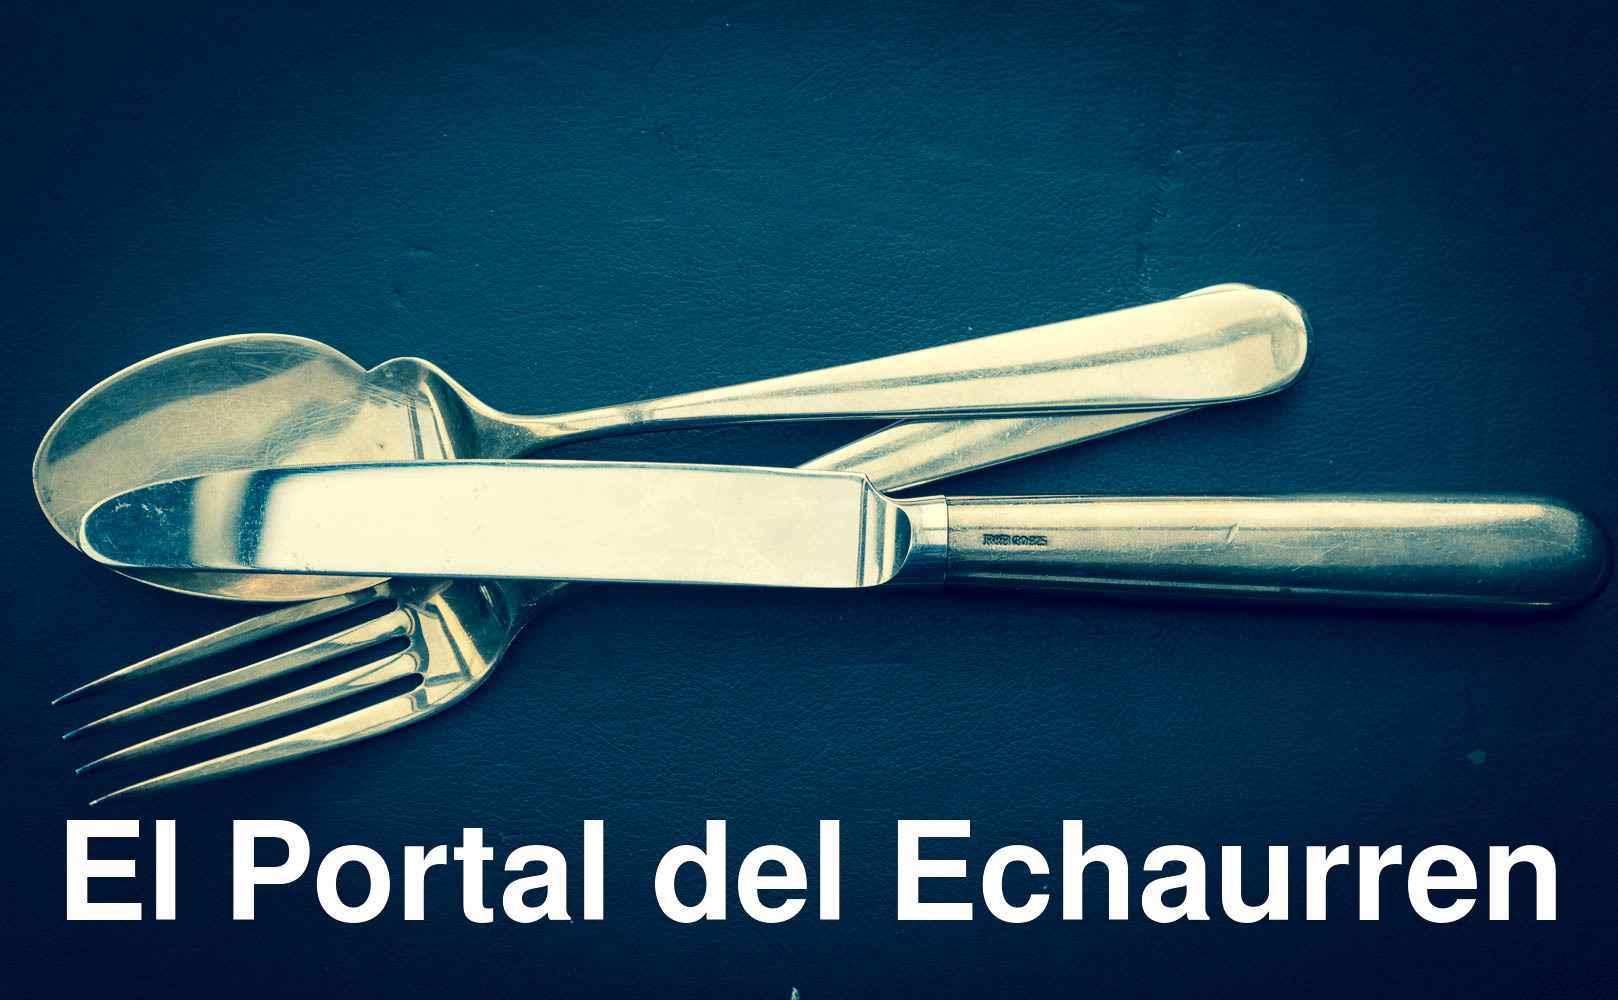 Restaurantkritik: El Portal del Echaurren in Ezcaray, Spanien,